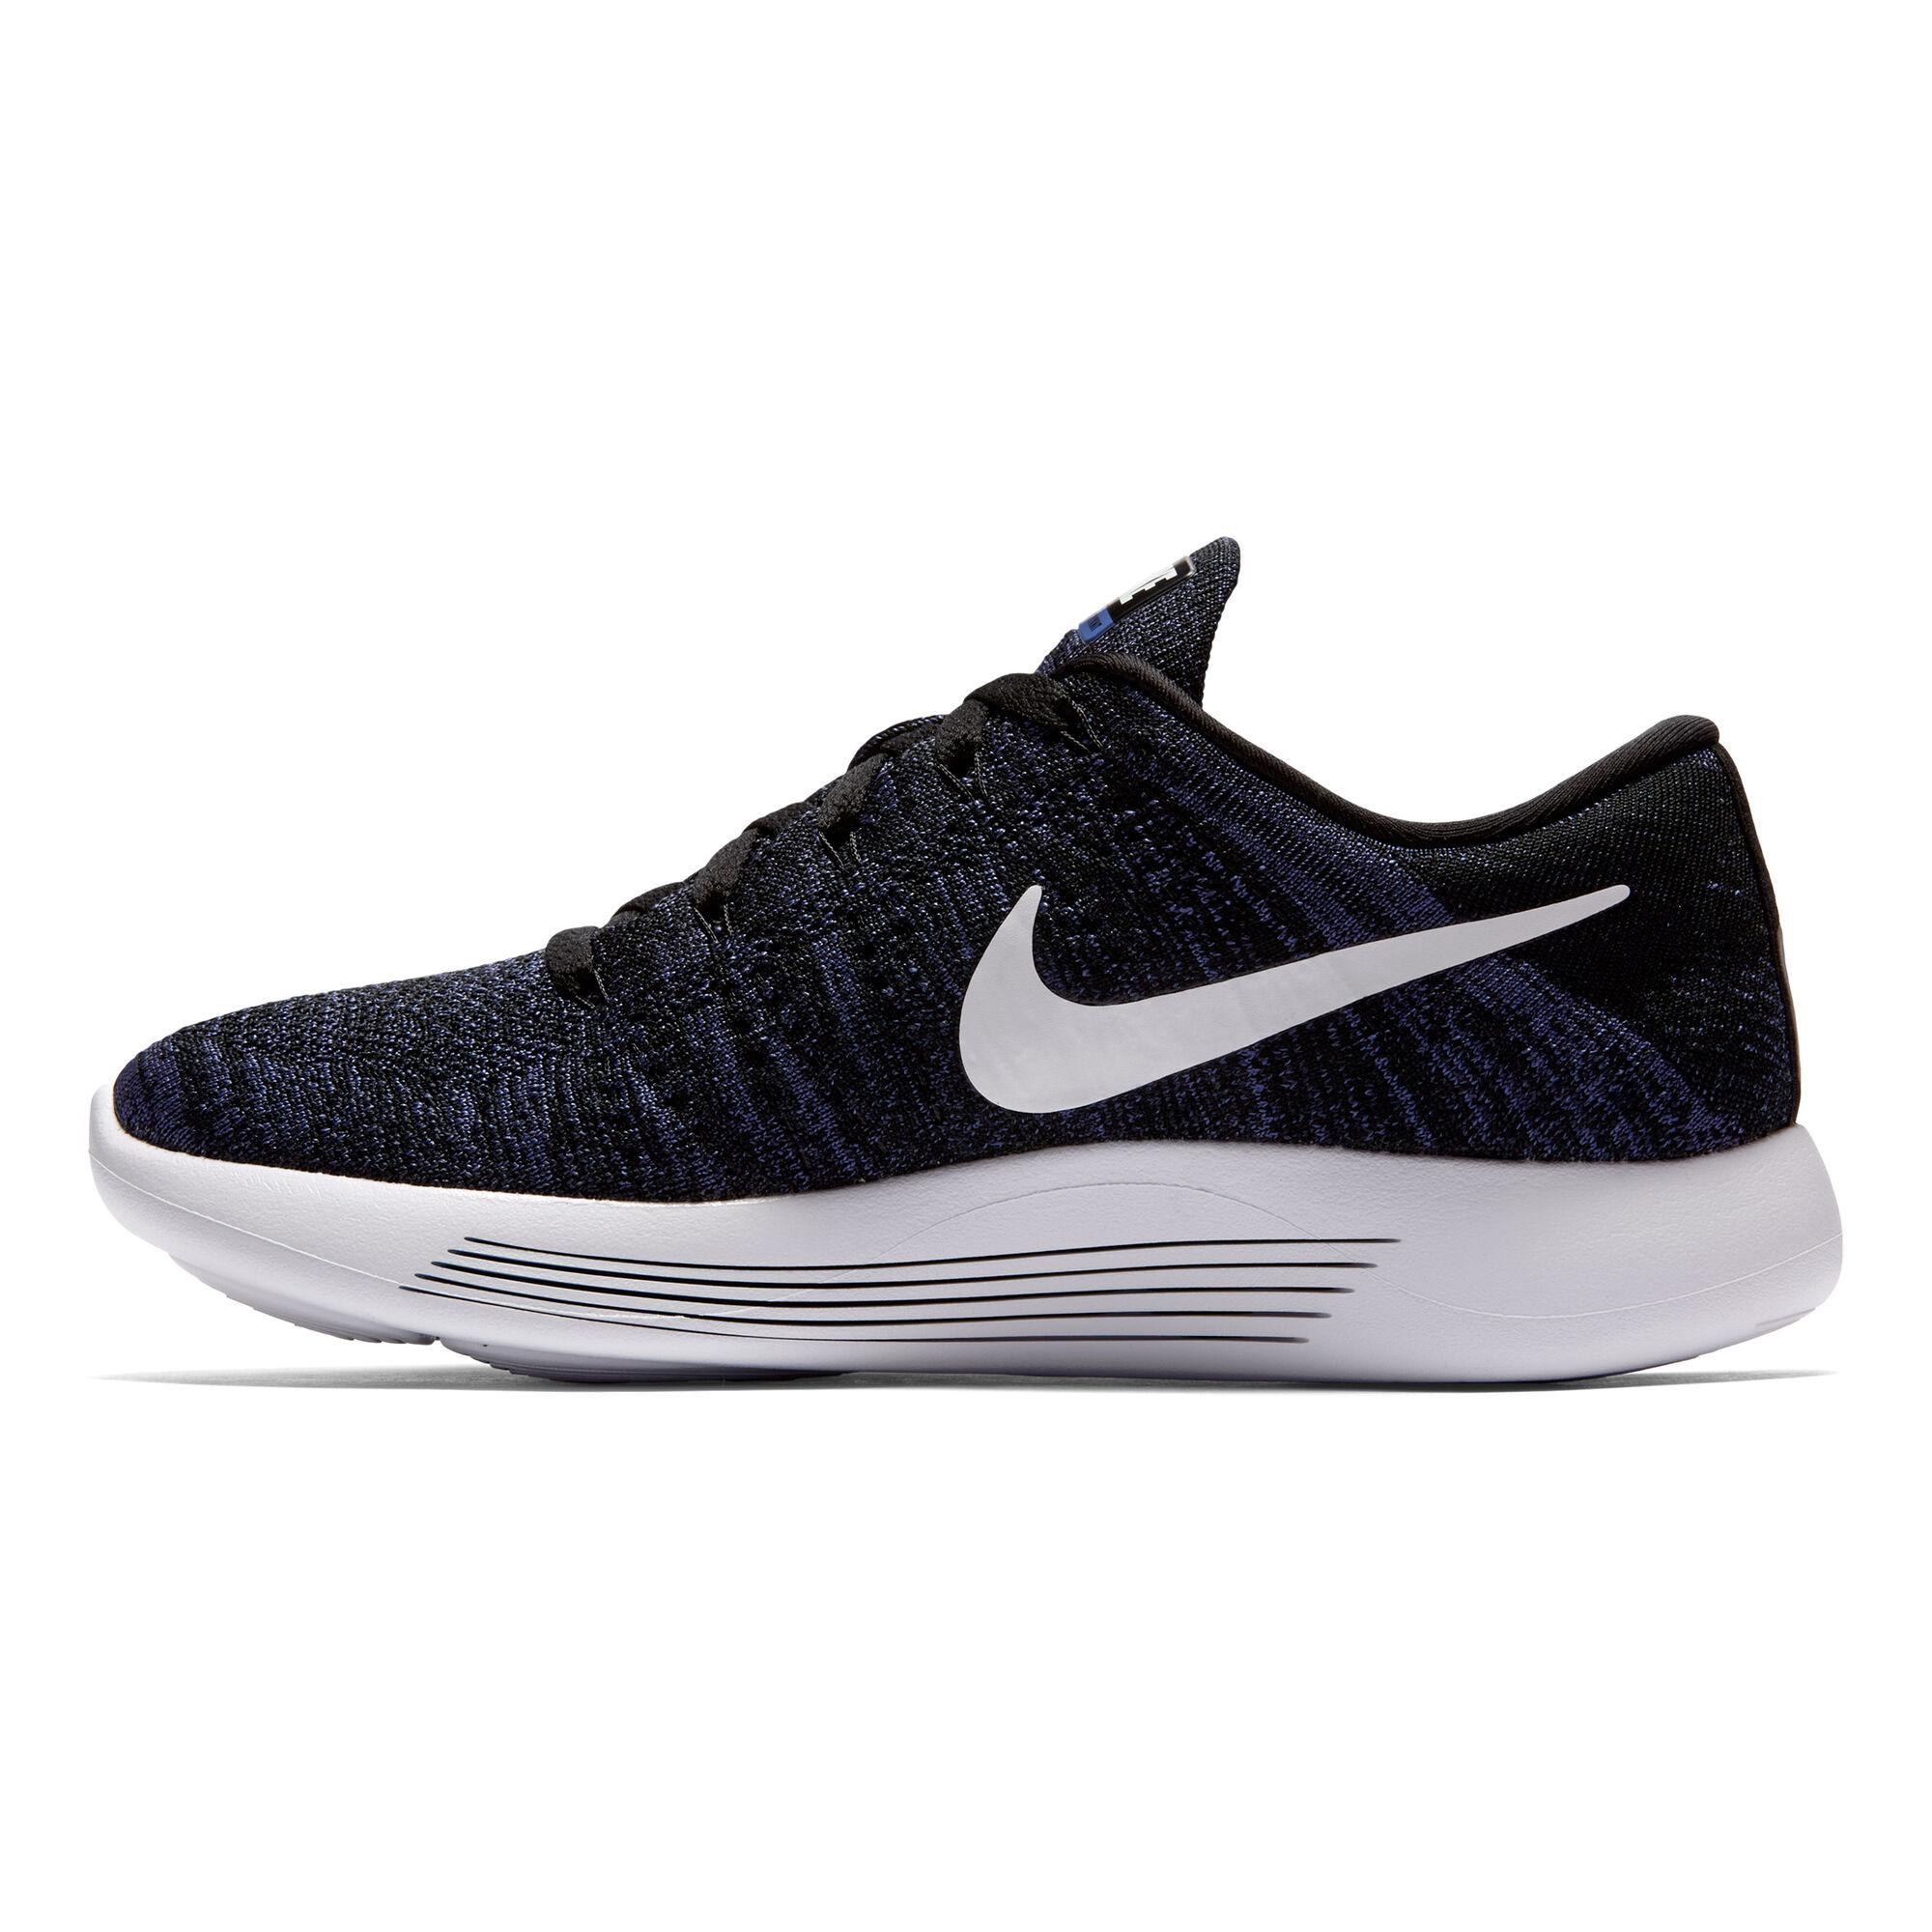 best service 1a8f3 c277a Nike · Nike · Nike · Nike · Nike · Nike · Nike · Nike · Nike. Nike  LunarEpic Low Flyknit ...